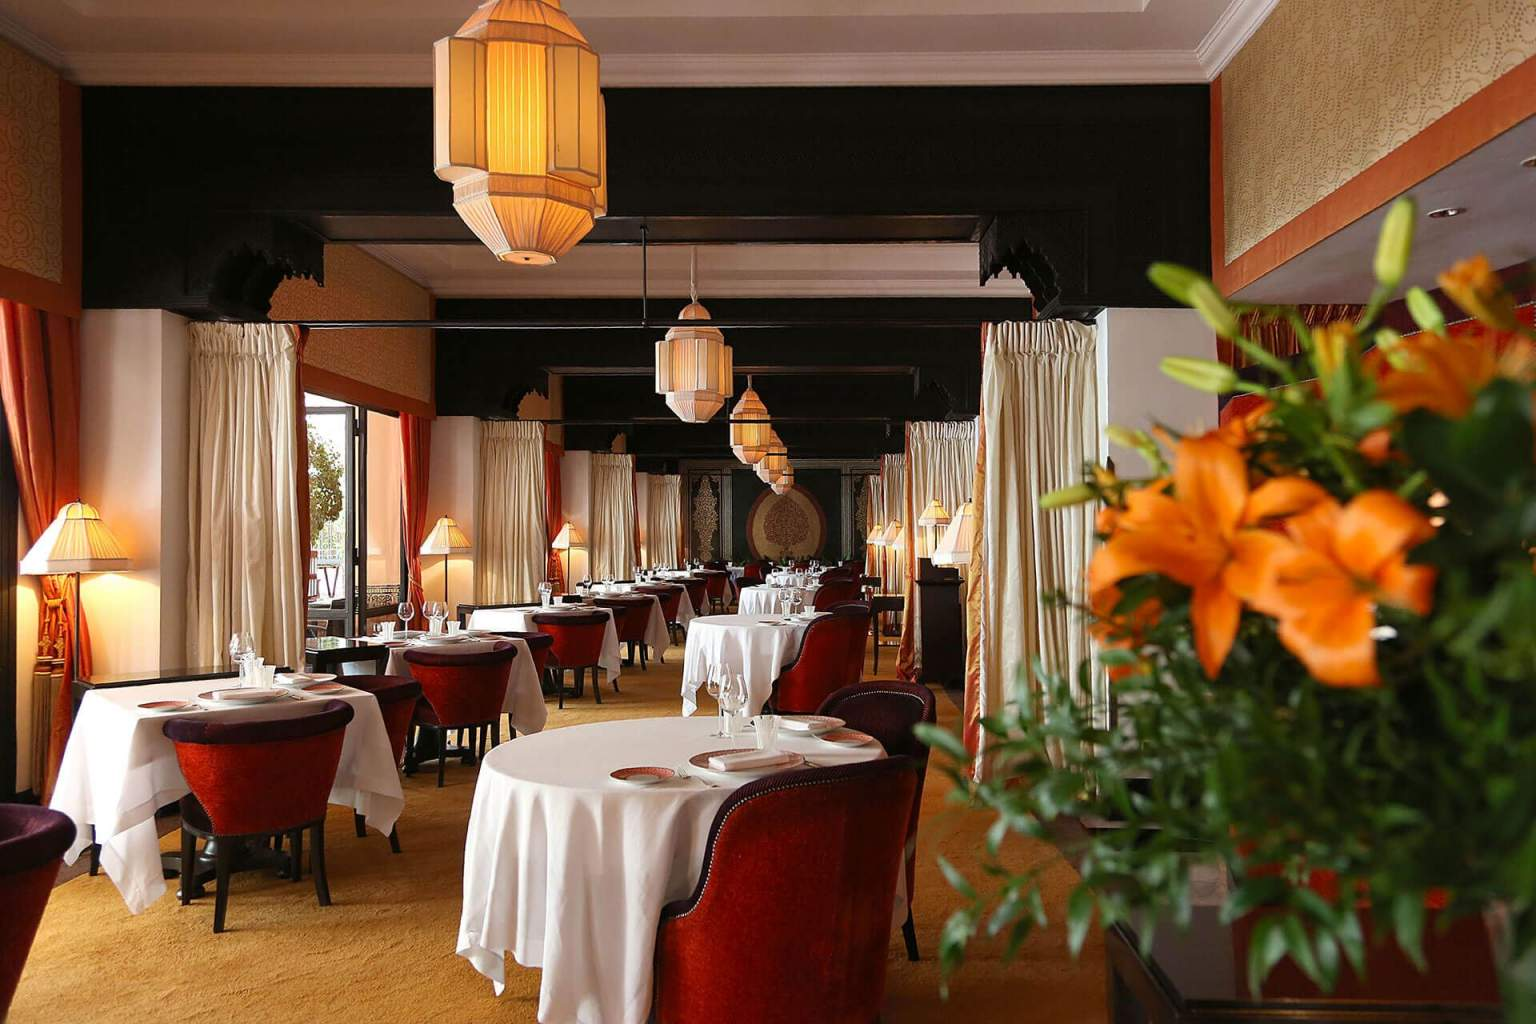 La Mamounia Restaurant